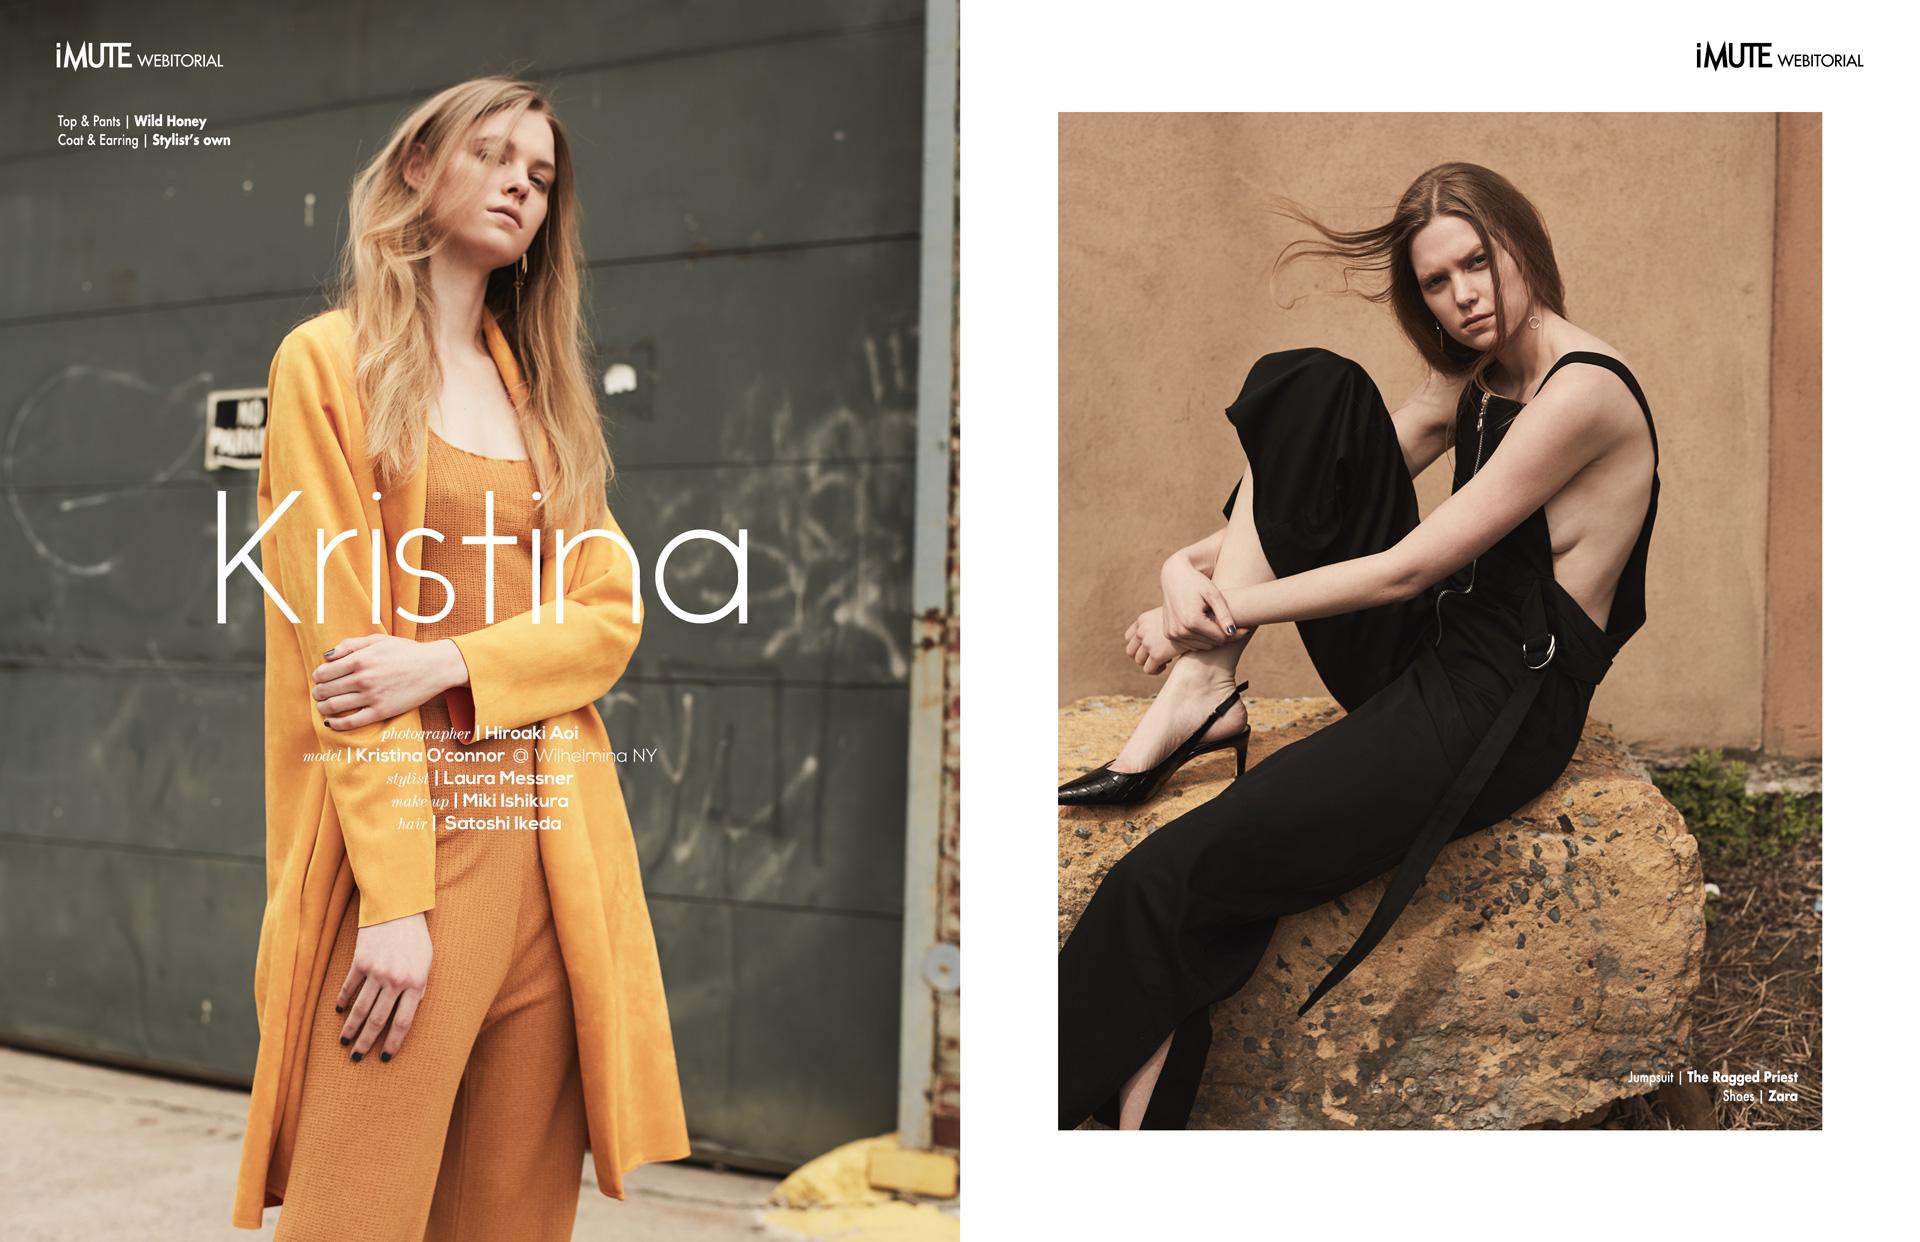 Kristina webitorial for iMute Magazine Photographer | Hiroaki Aoi Model | Kristina O'connor @ Wilhelmina NY Stylist | Laura Messner Makeup | Miki Ishikura Hair | Satoshi Ikeda